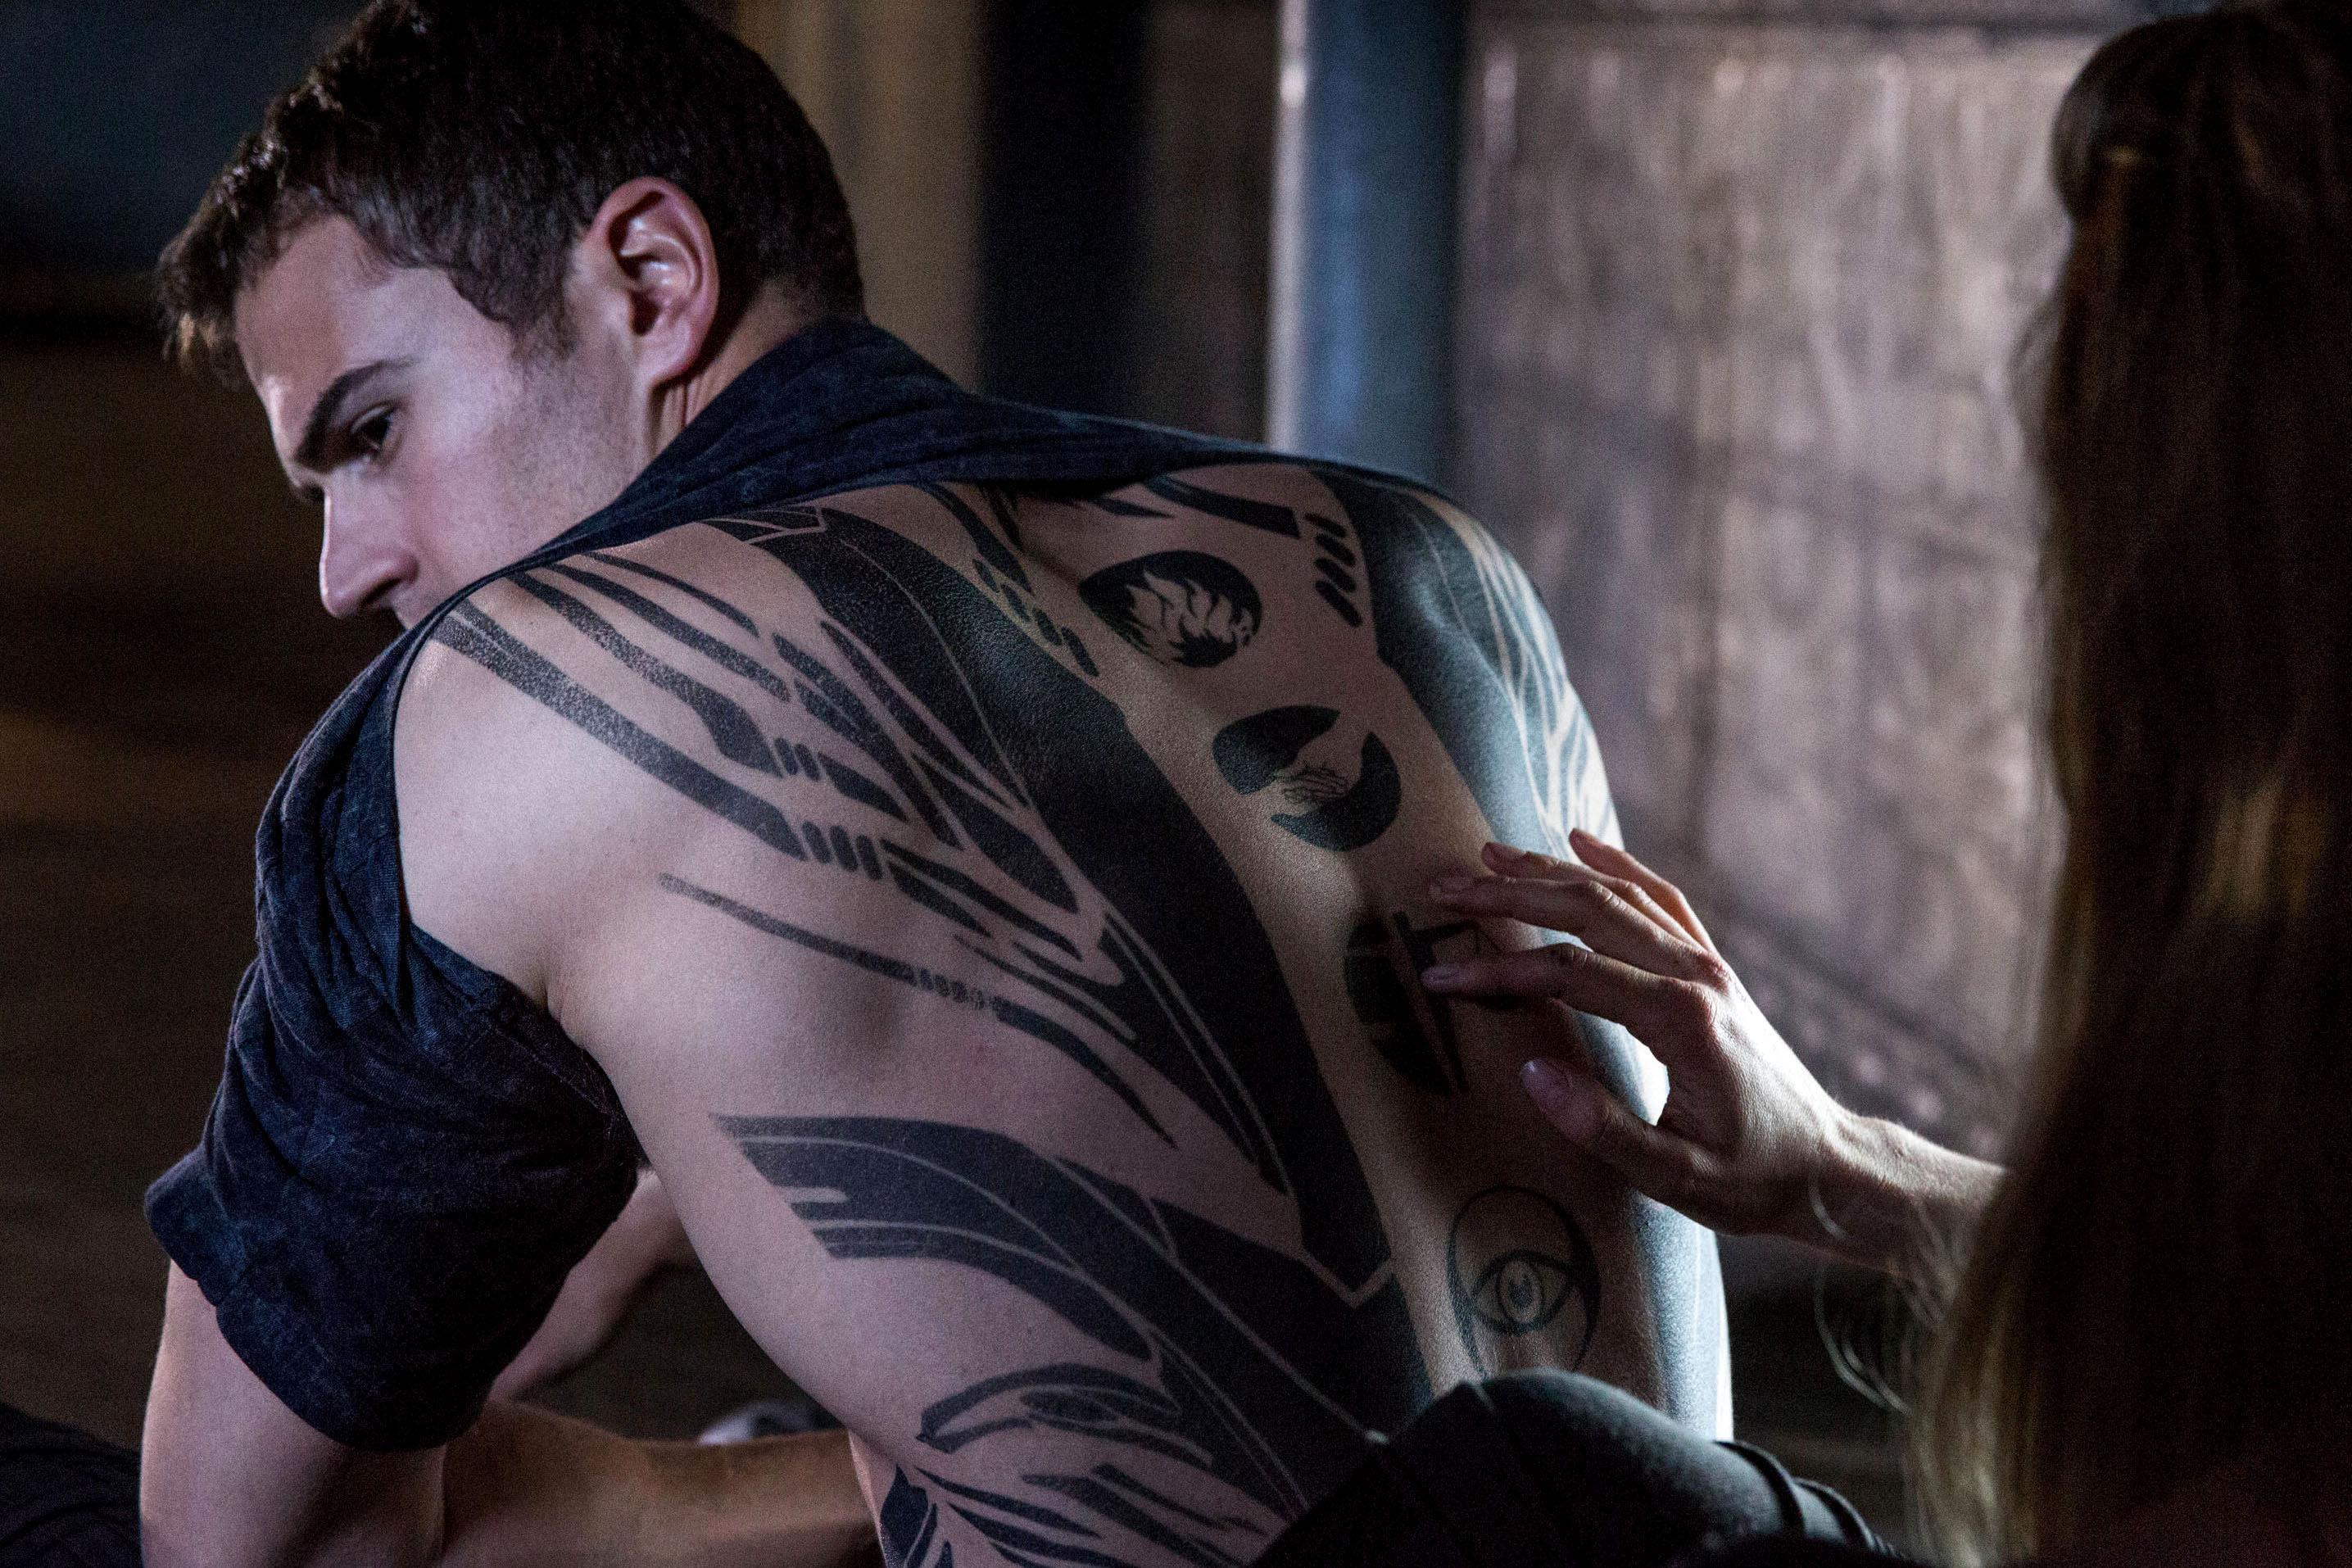 ¿Por qué se apoda Cuatro , Tobias Eaton?